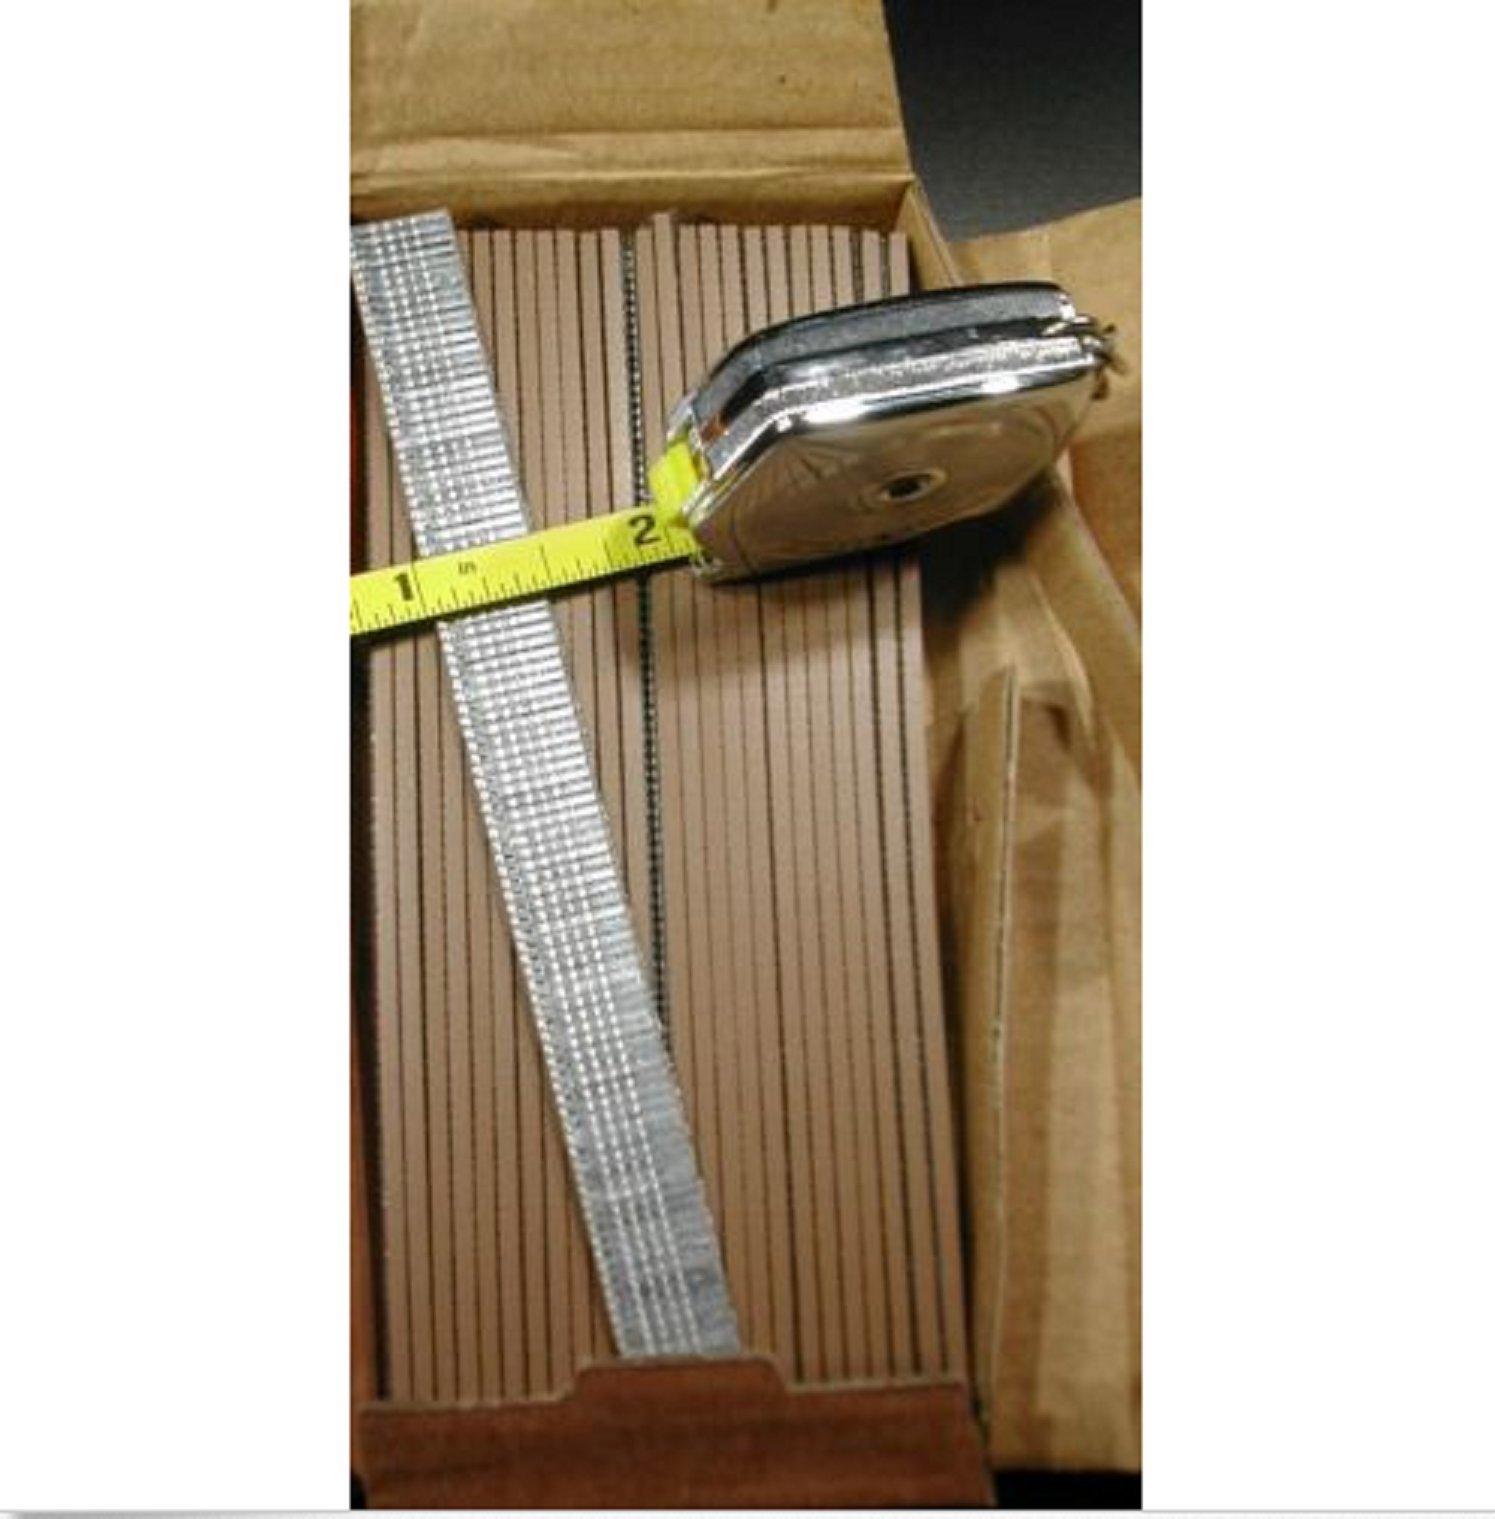 USA Premium Store Finish Brad Nails 18 gauge 1/2'' Inch Long 5,000pcs (Galvanized Chisel Point)